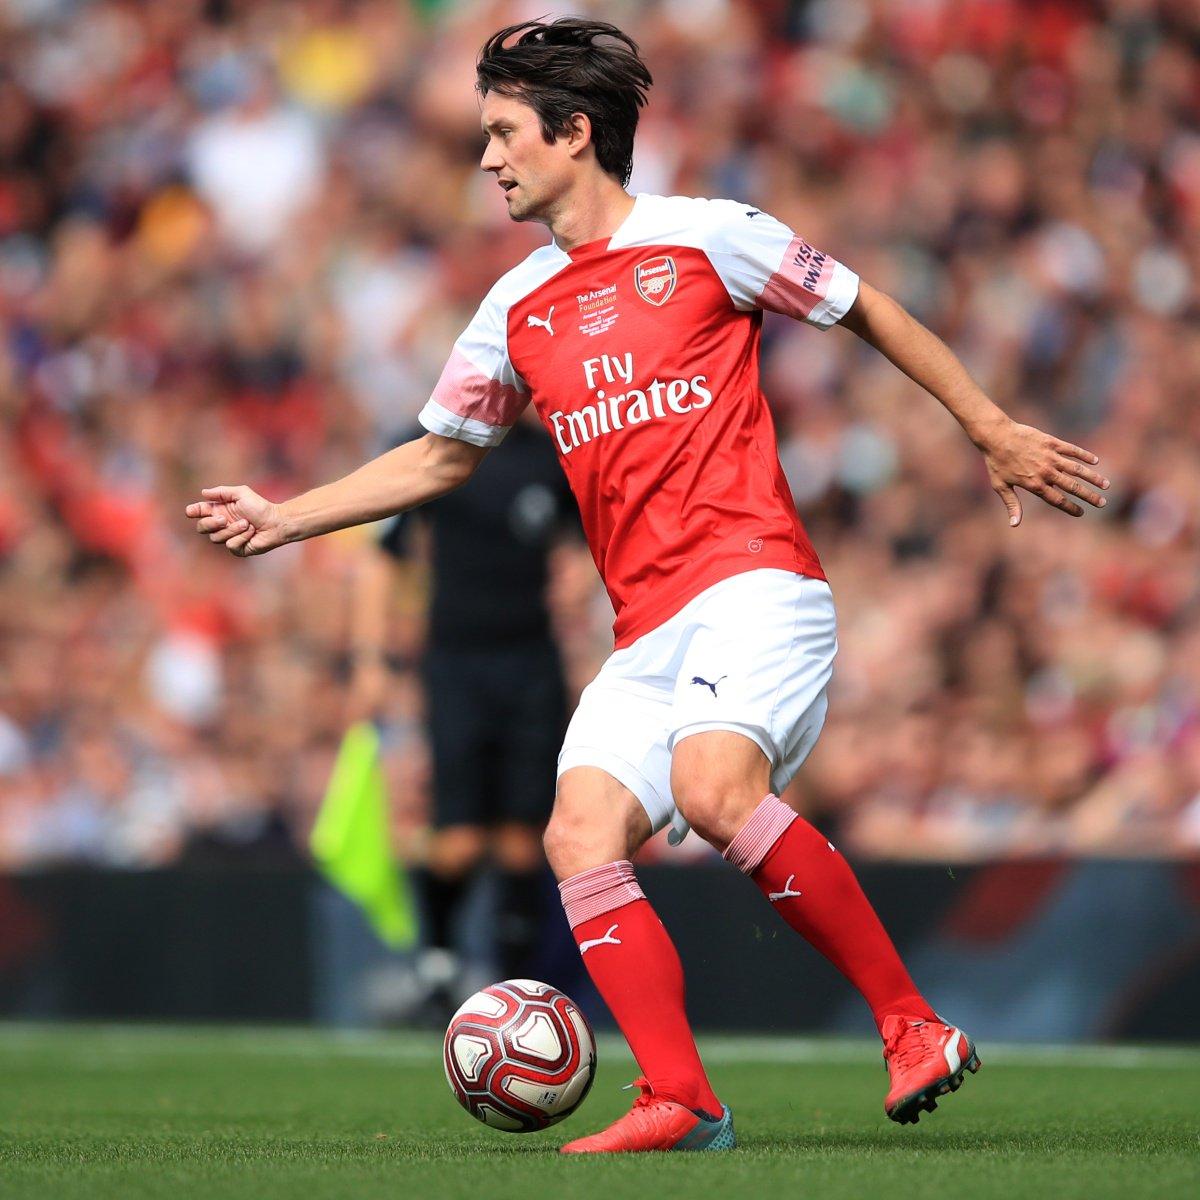 premium selection 2facb 0aae6 Arsenal on Twitter: